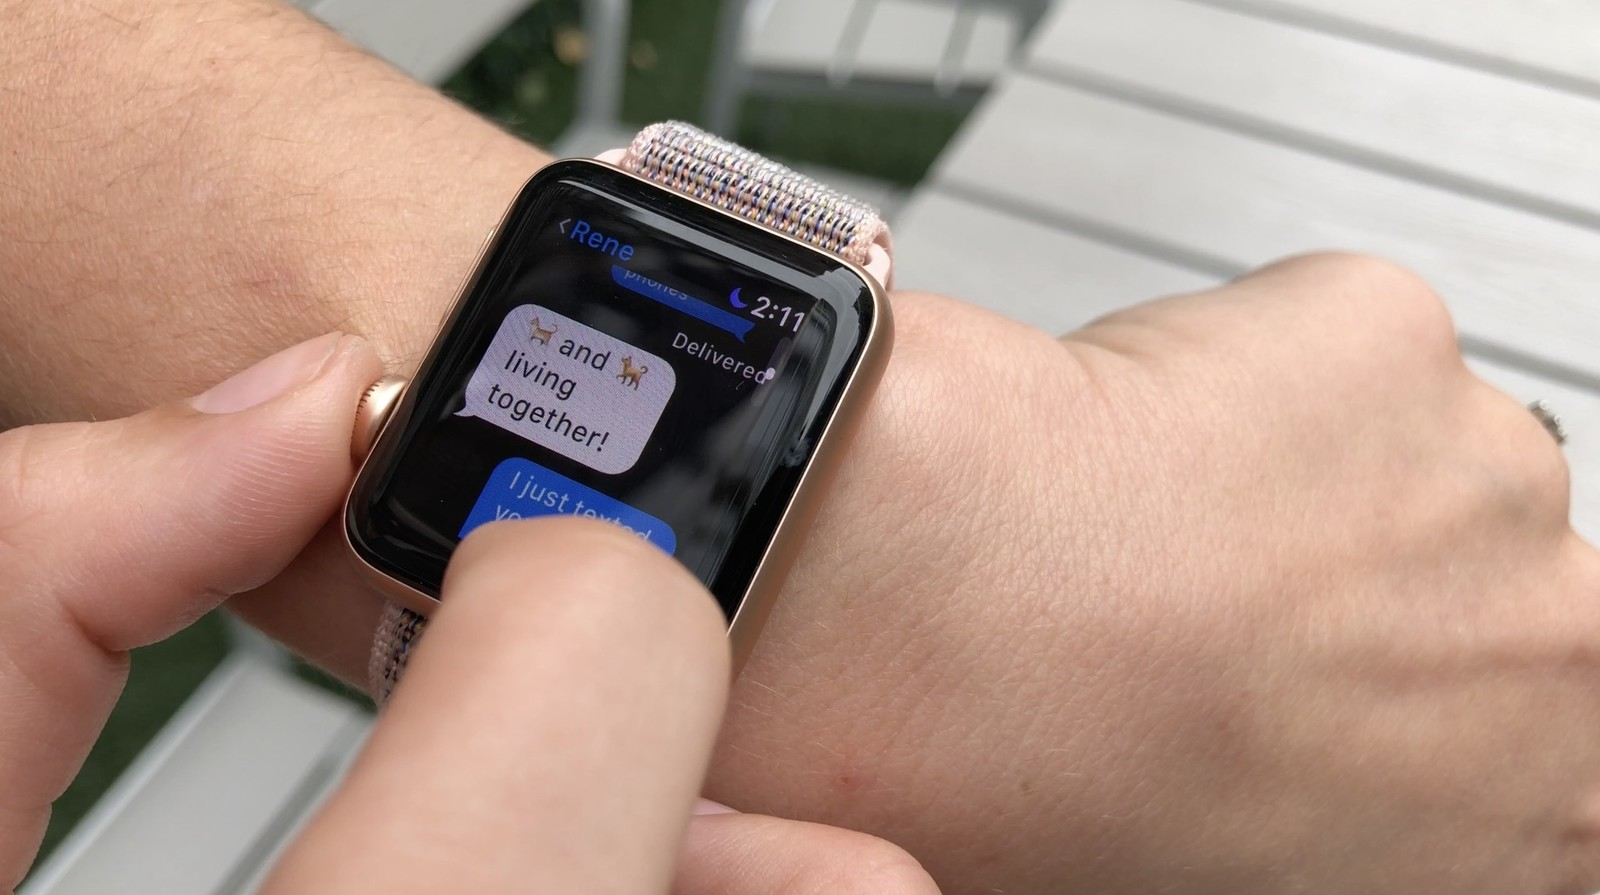 Come usare Apple Watch LTE su Android